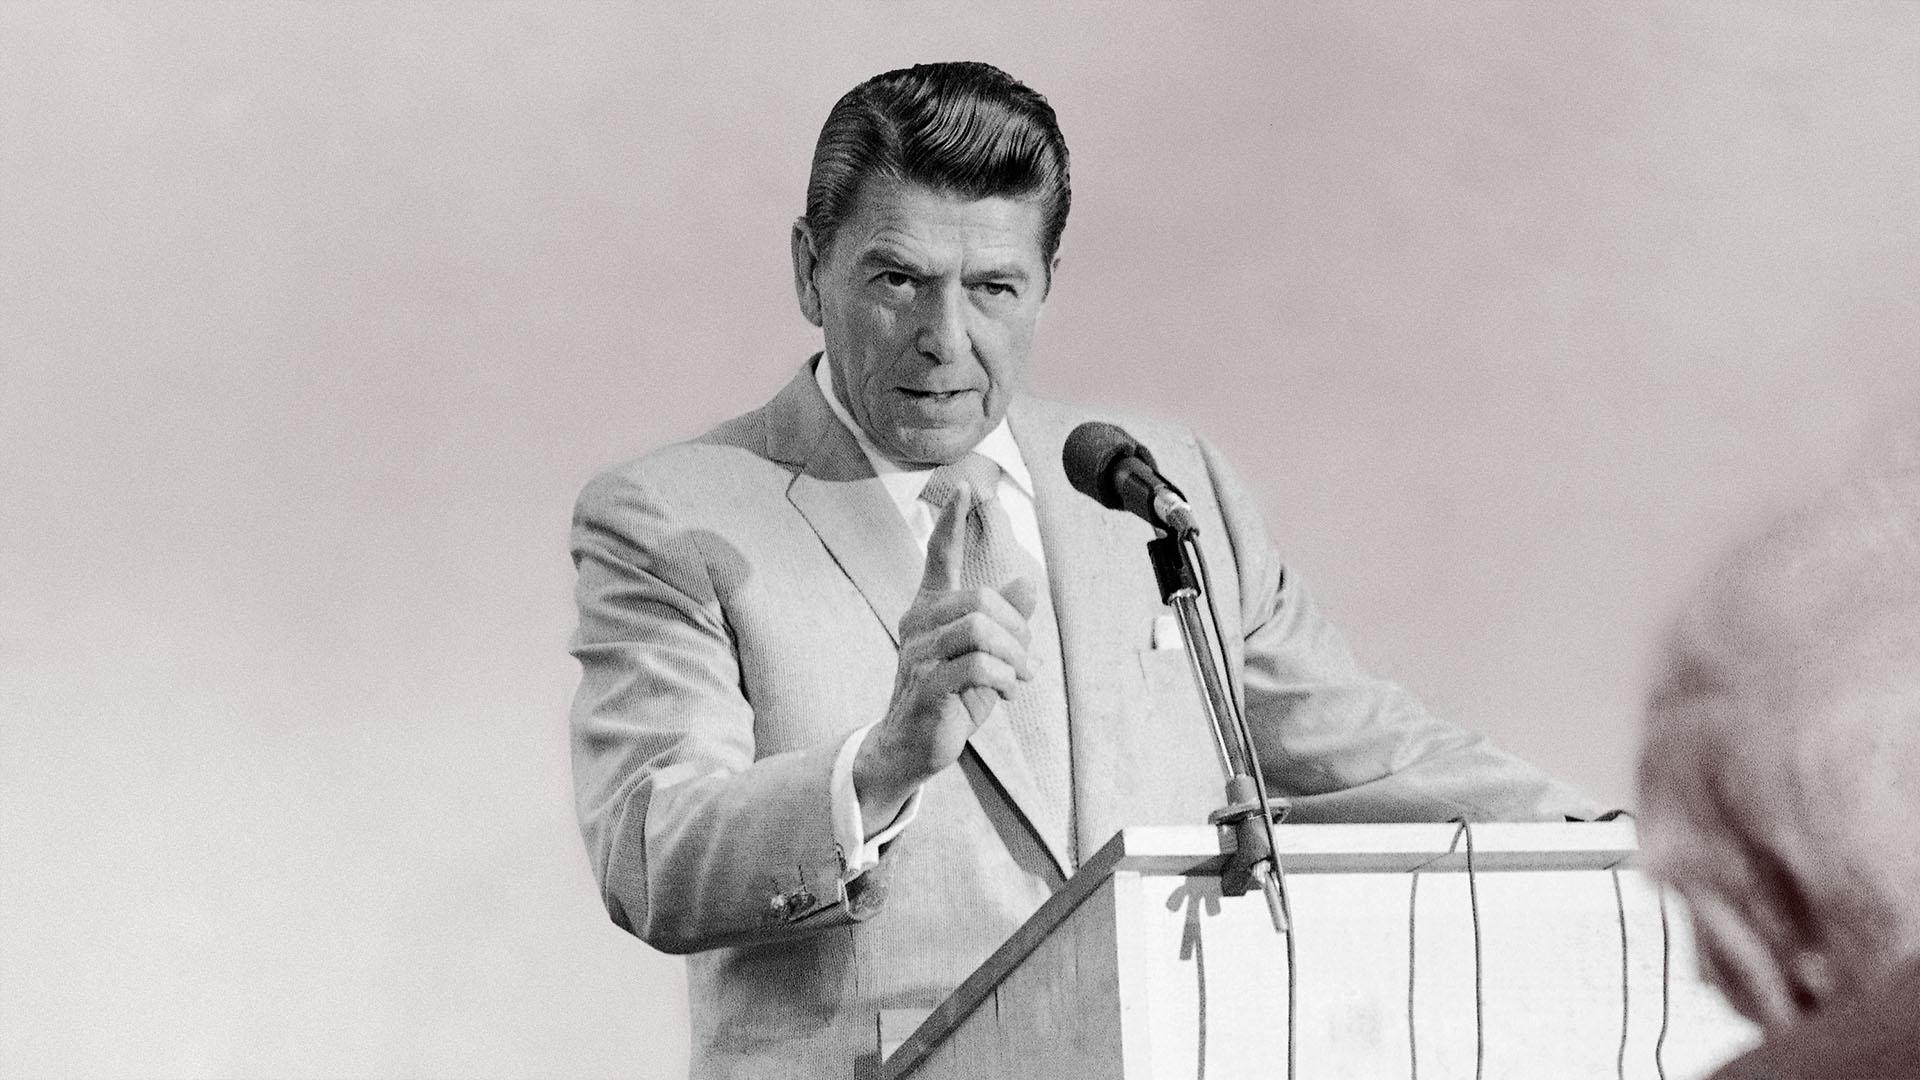 Ronald Reagan 1834918 Hd Wallpaper Backgrounds Download